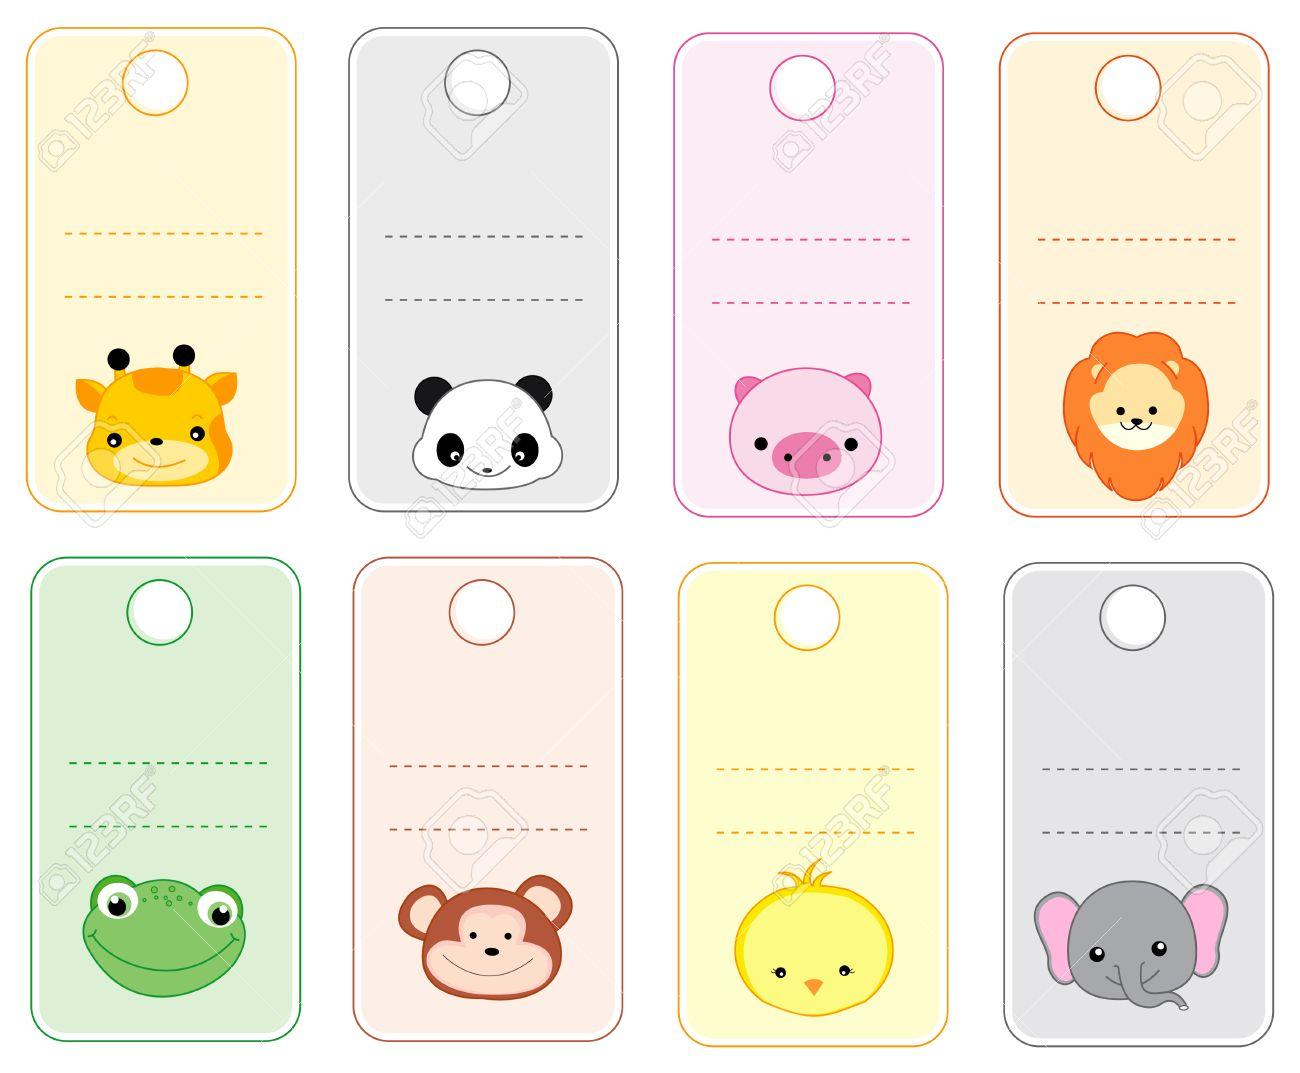 Colorful Printable Gift Tags / Name Tags With Cute Animal Faces - Free Printable Gift Name Tags